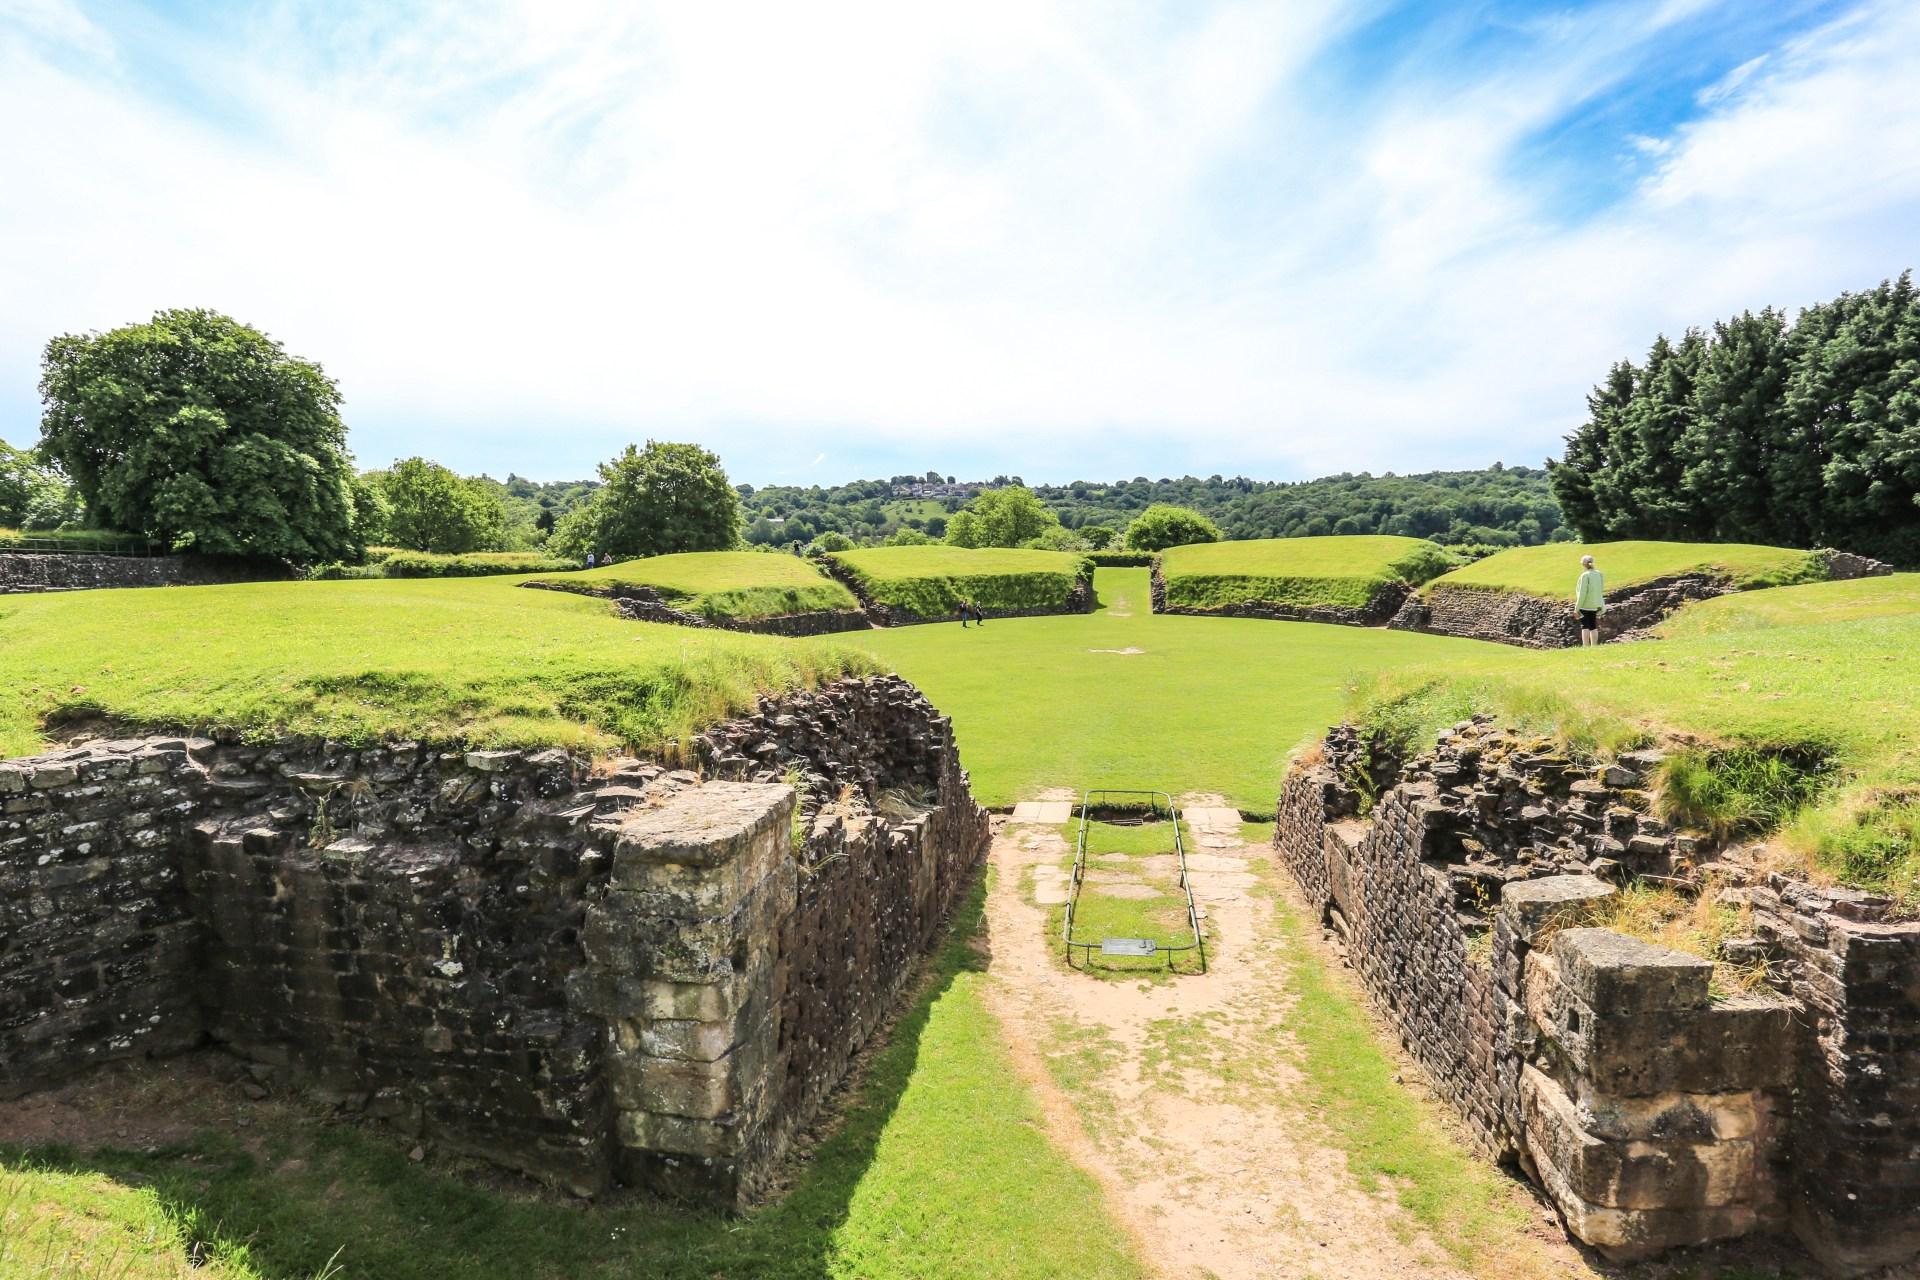 The Roman Amphitheatre in Caerleon